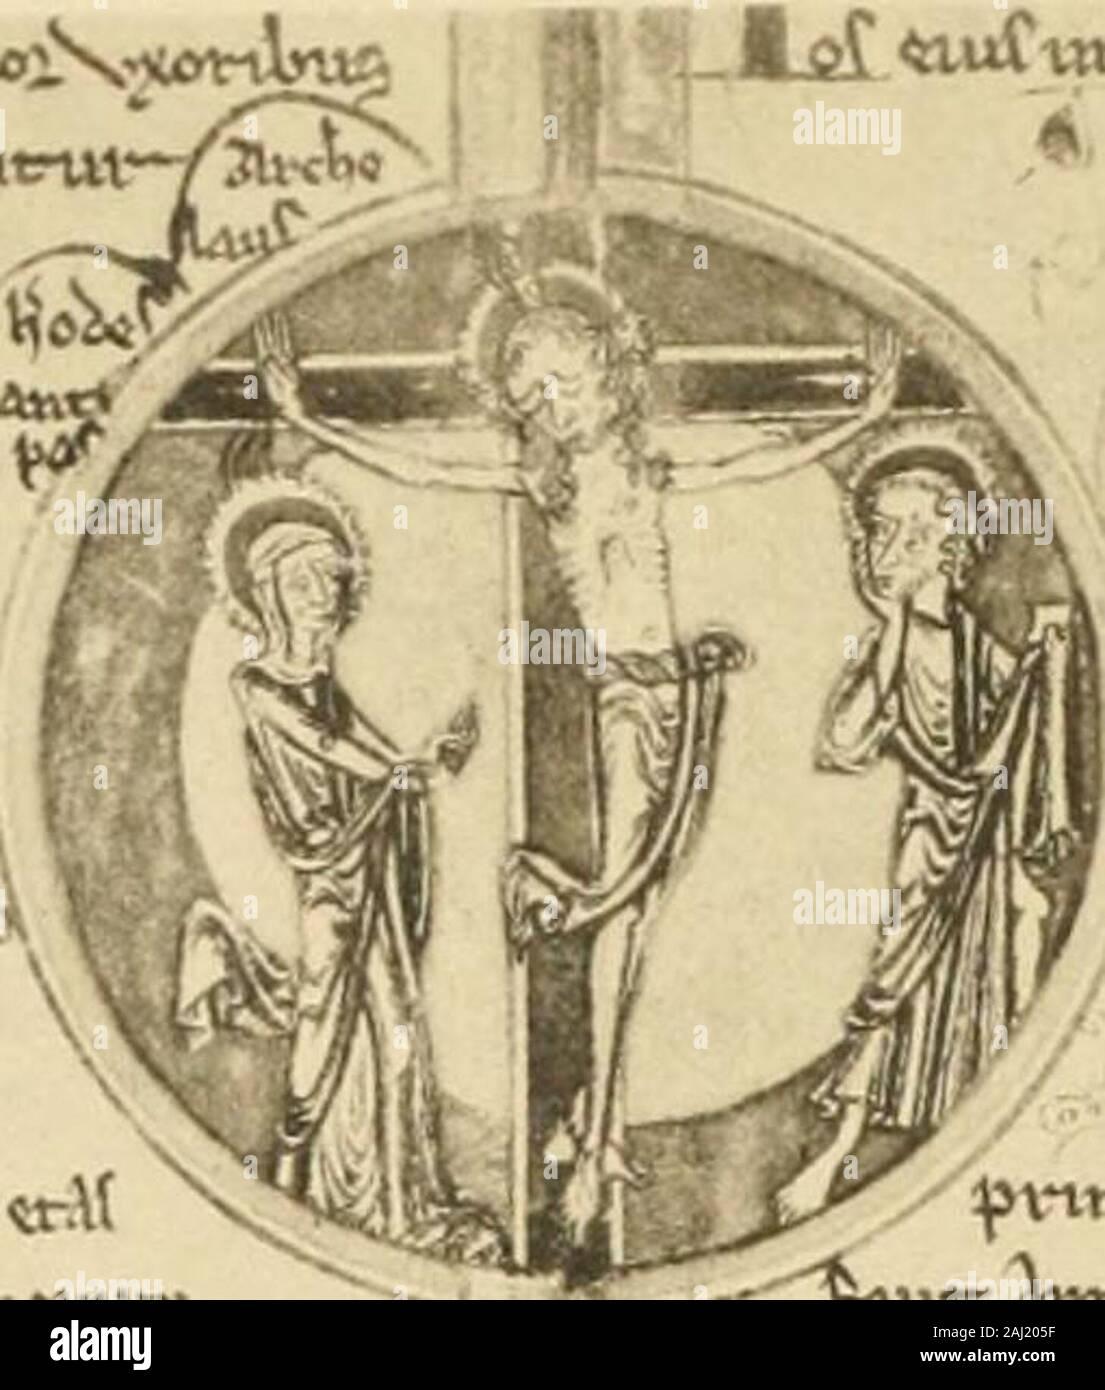 "Catálogo de antigüedades & posterior medieval que figura en el Museo Mayer, incluida la Mather colección de miniaturas y medallas relativas a la familia Bonaparte . r-^^ ^^^ (aU , (3knttv?l VVwltVVi, ? V^i^y J^ ^) ul) convergencia eccoOiruf Arel""^xo t""A"" un o2iltl""t Hcruf pott- Uttsr^tuti""""tt cvtrn AmttUd M l-^g-ue 1tiuti""nf Vi""*i *yj(.>wf vs>mita t""nmt>f Aau£4twn""l""""^^.Wr. Foto de stock"